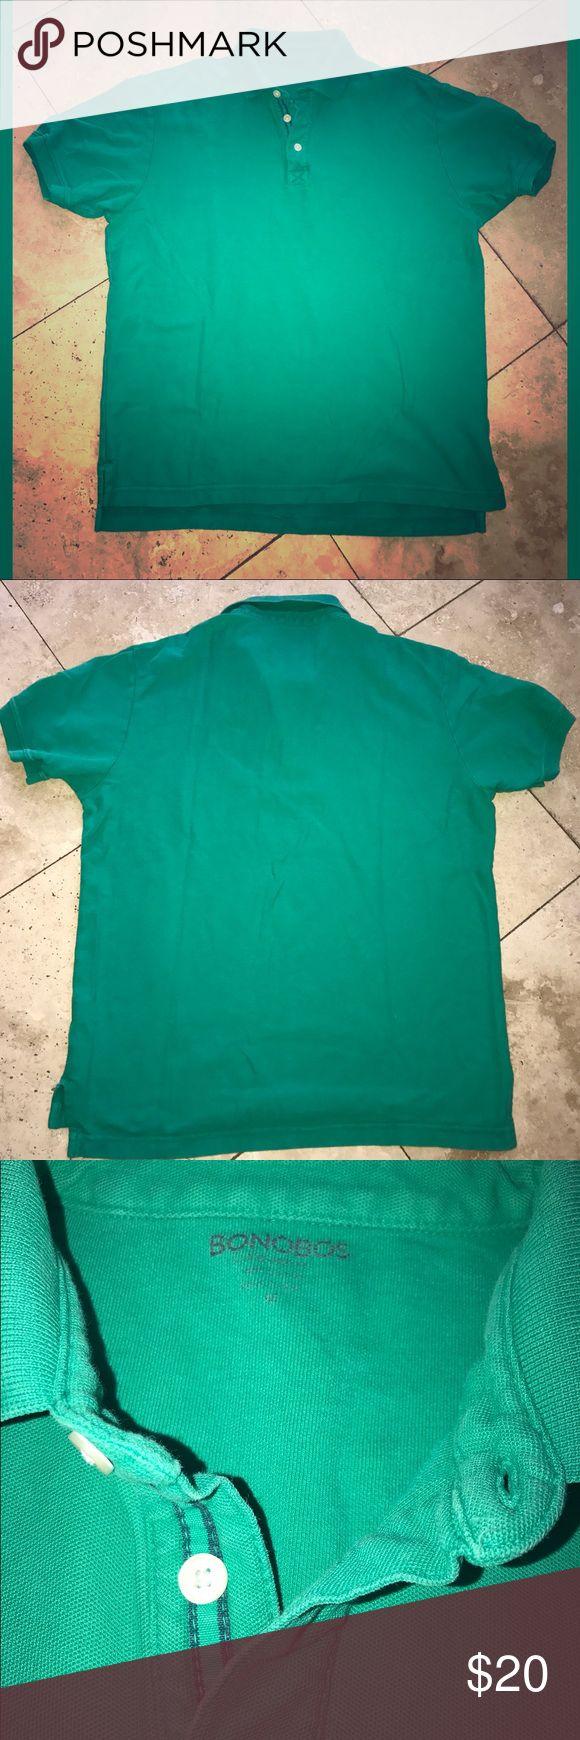 Bonobos Green Polo Shirt No holes or stains Bonobos Shirts Polos